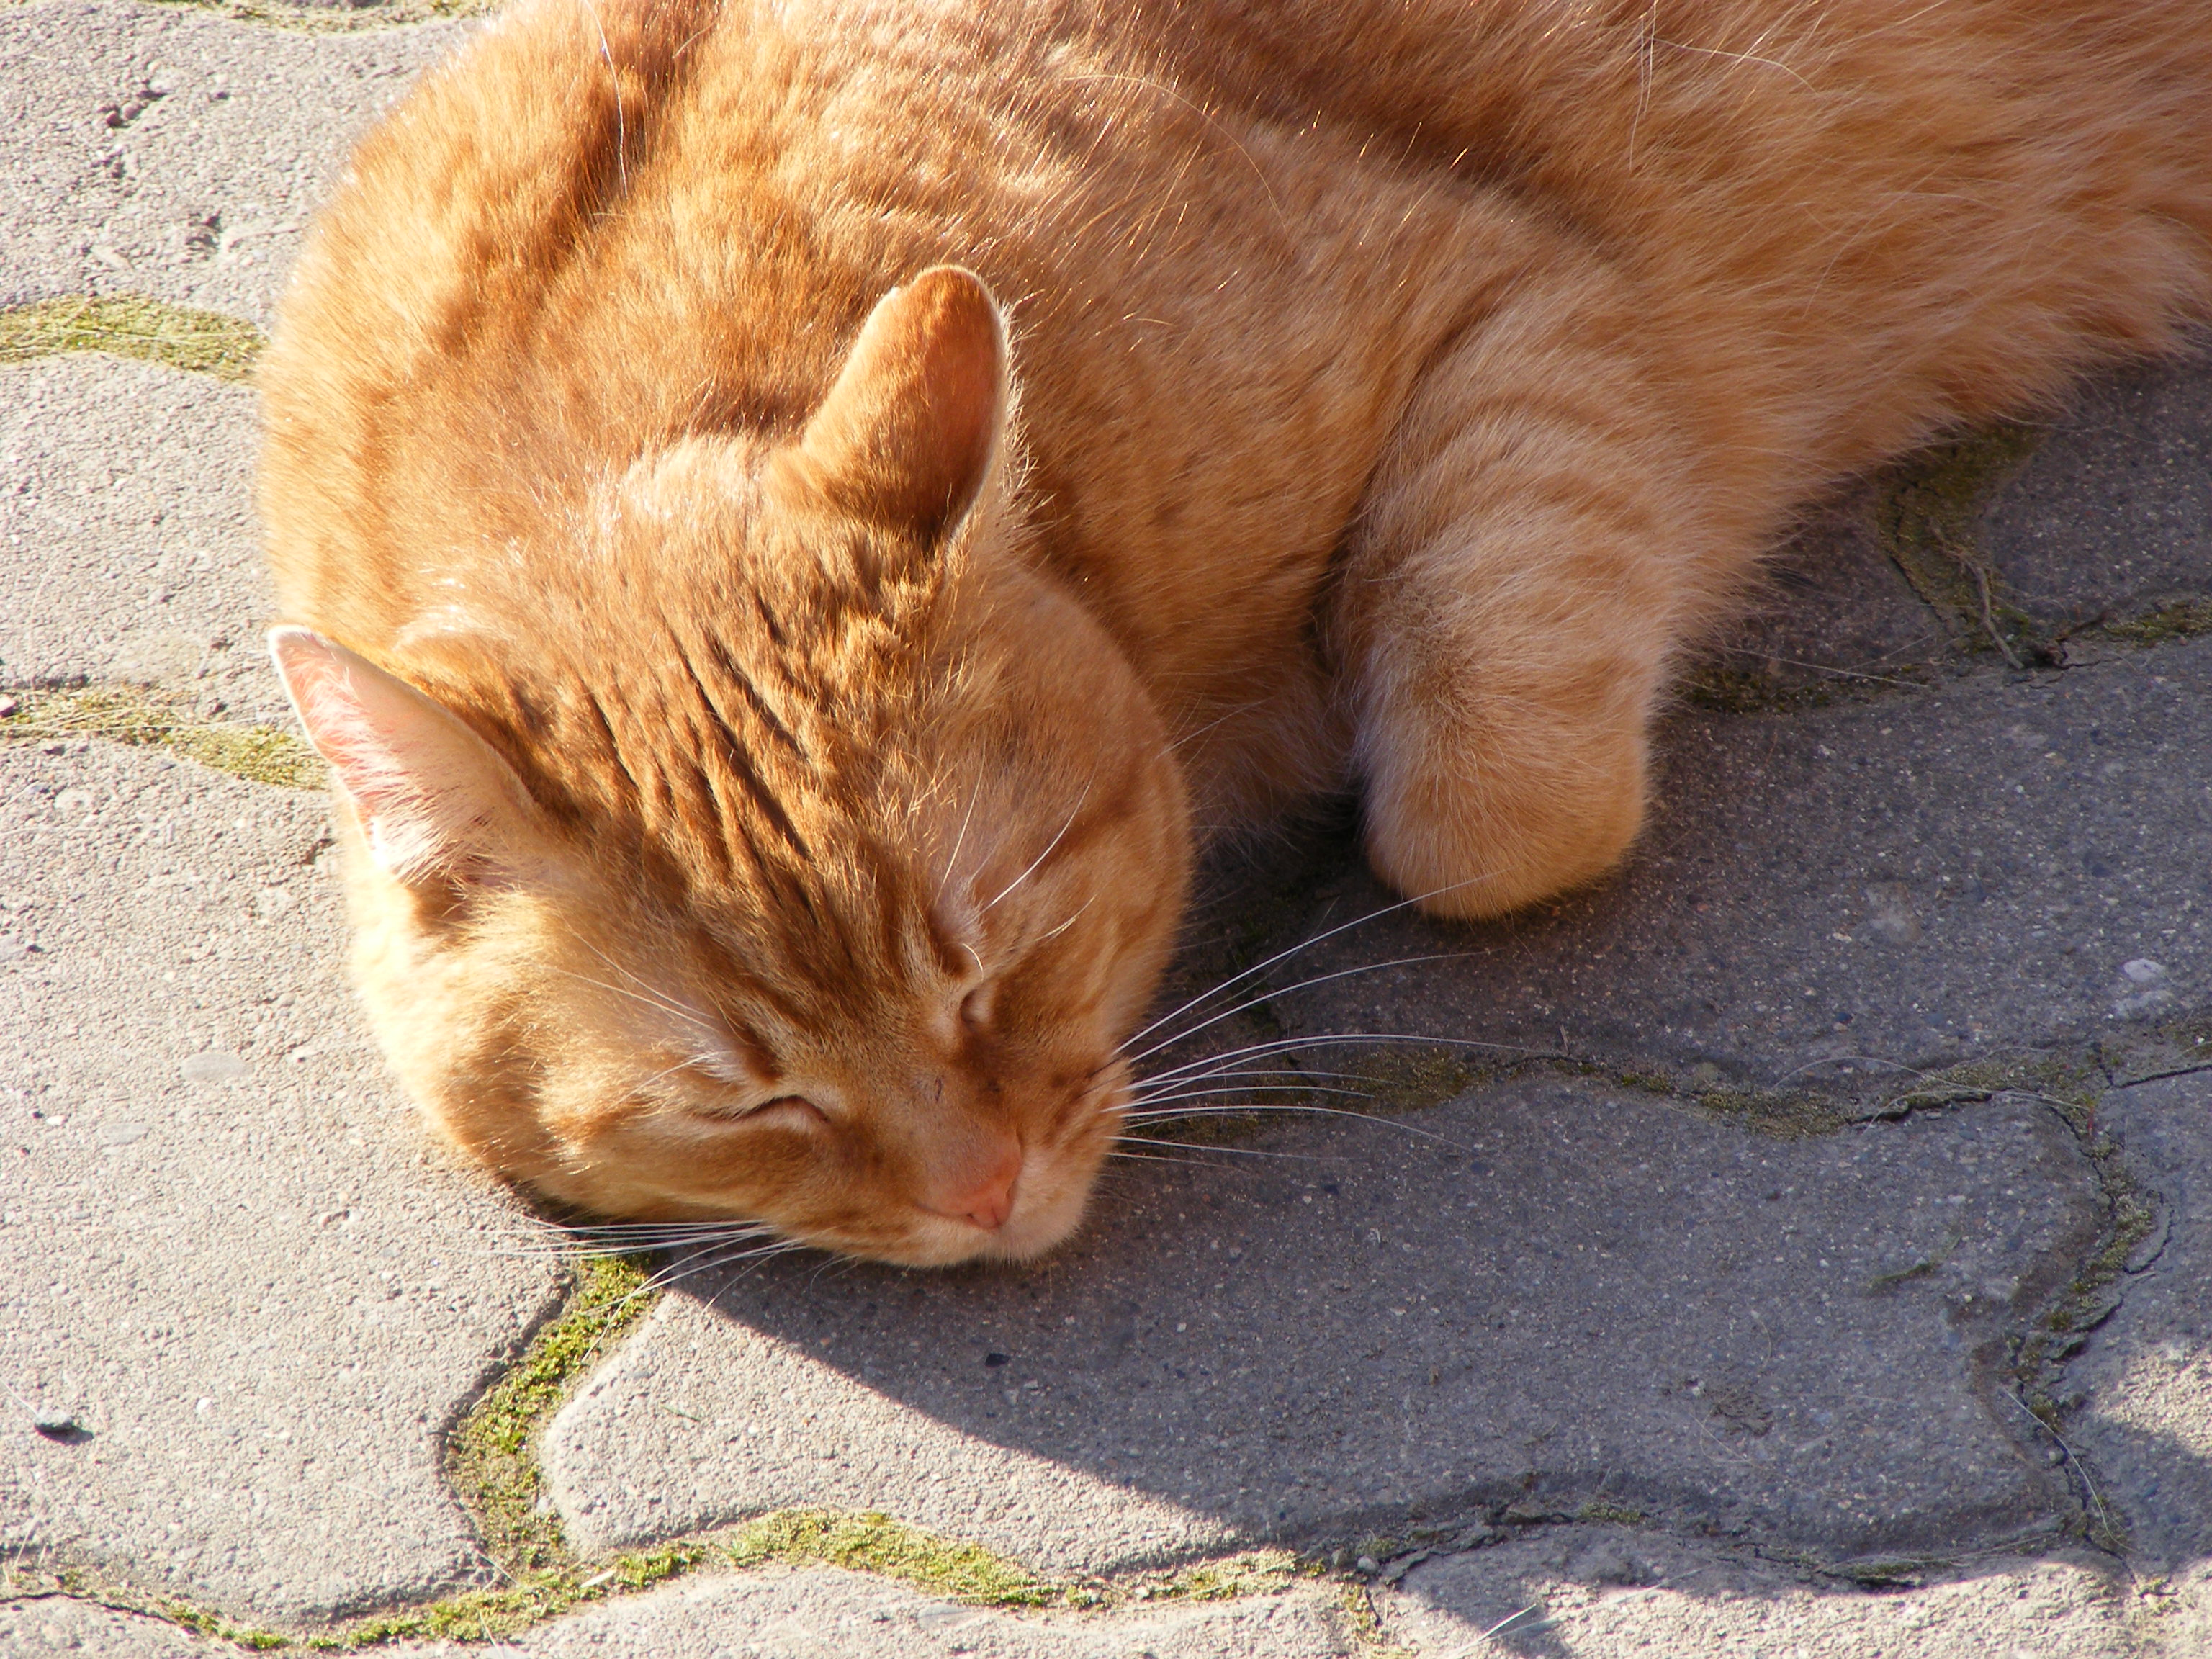 Sleeping Tabby Cat Cc0 Photo